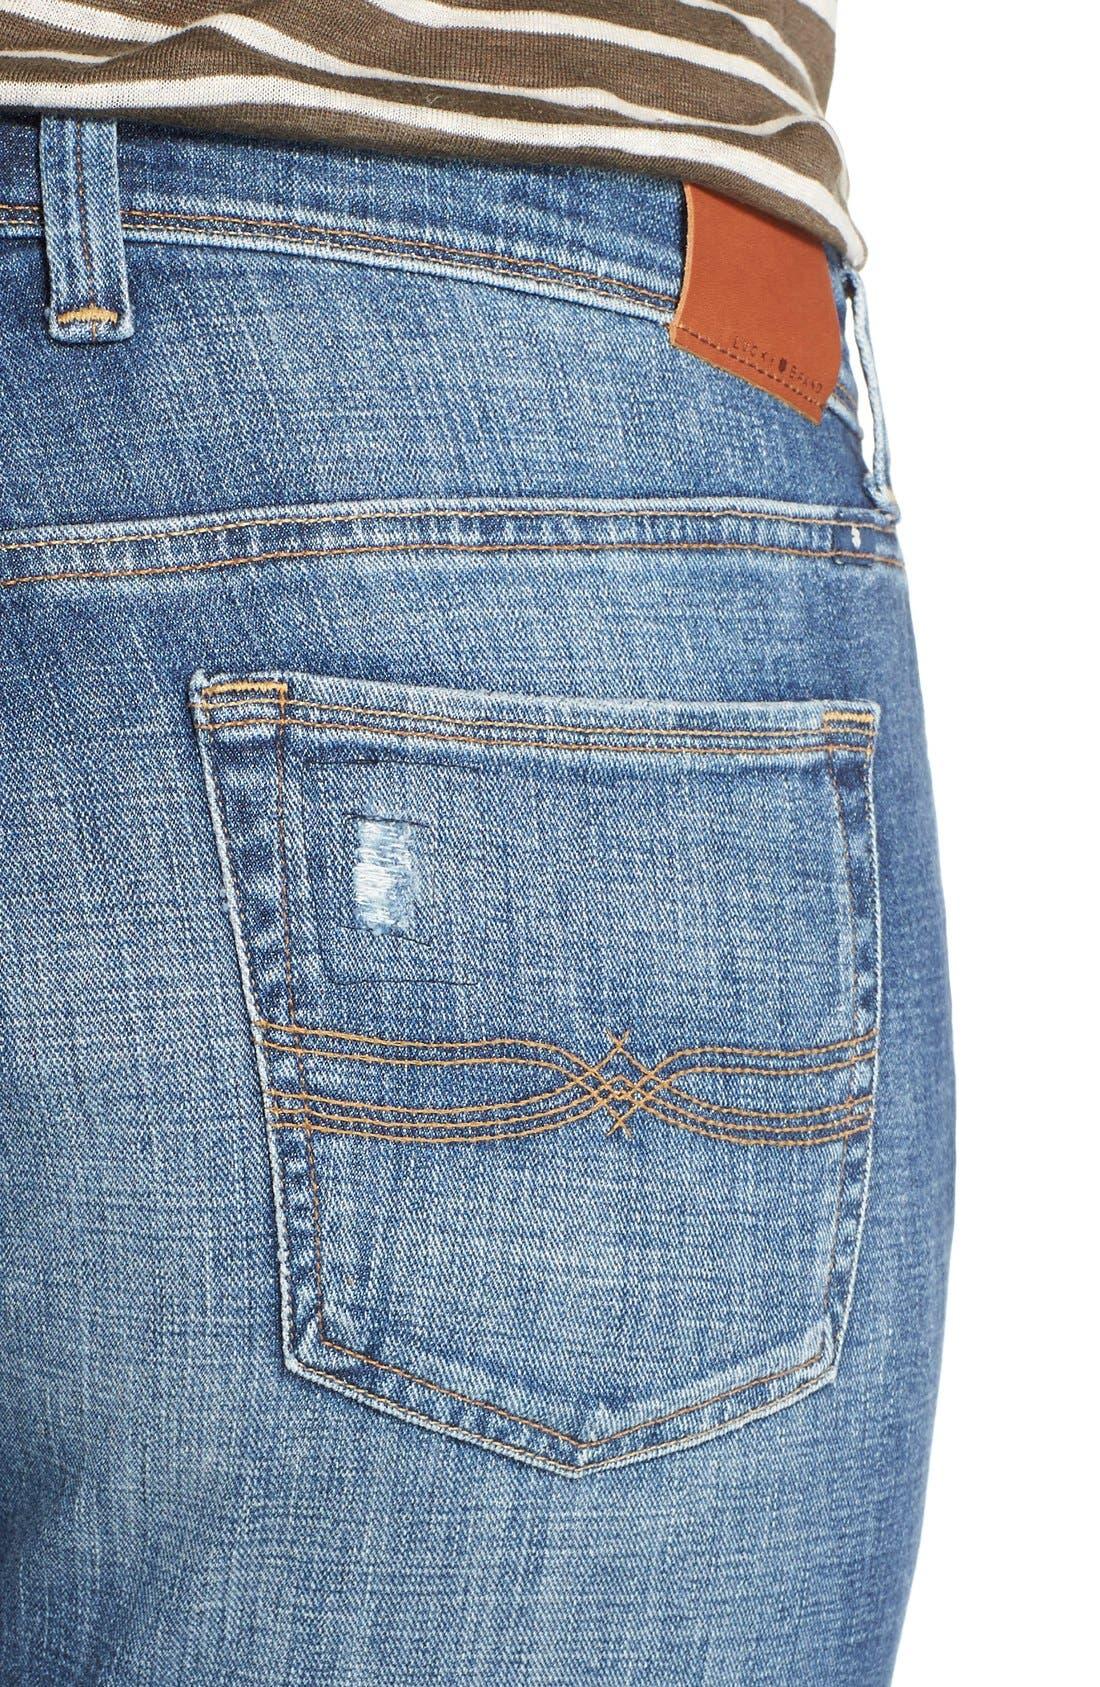 Alternate Image 5  - Lucky Brand Reese Distressed Boyfriend Jeans (Northridge Park) (Plus Size)